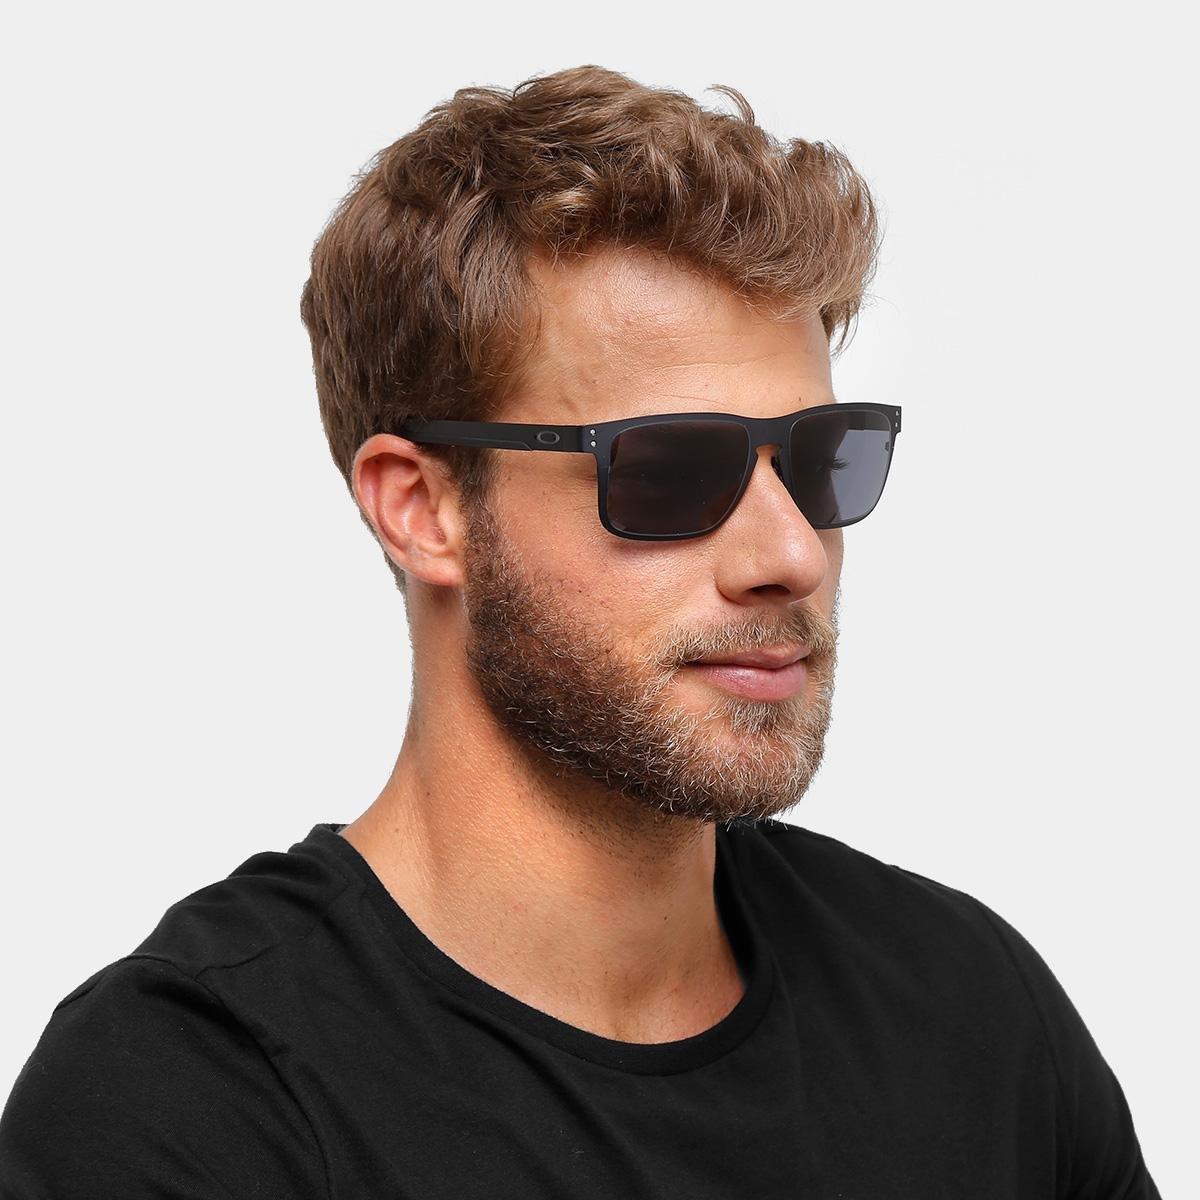 Óculos de Sol Oakley Holbrook Metal Masculino - Cinza - Compre Agora ... 1a0ecc93df